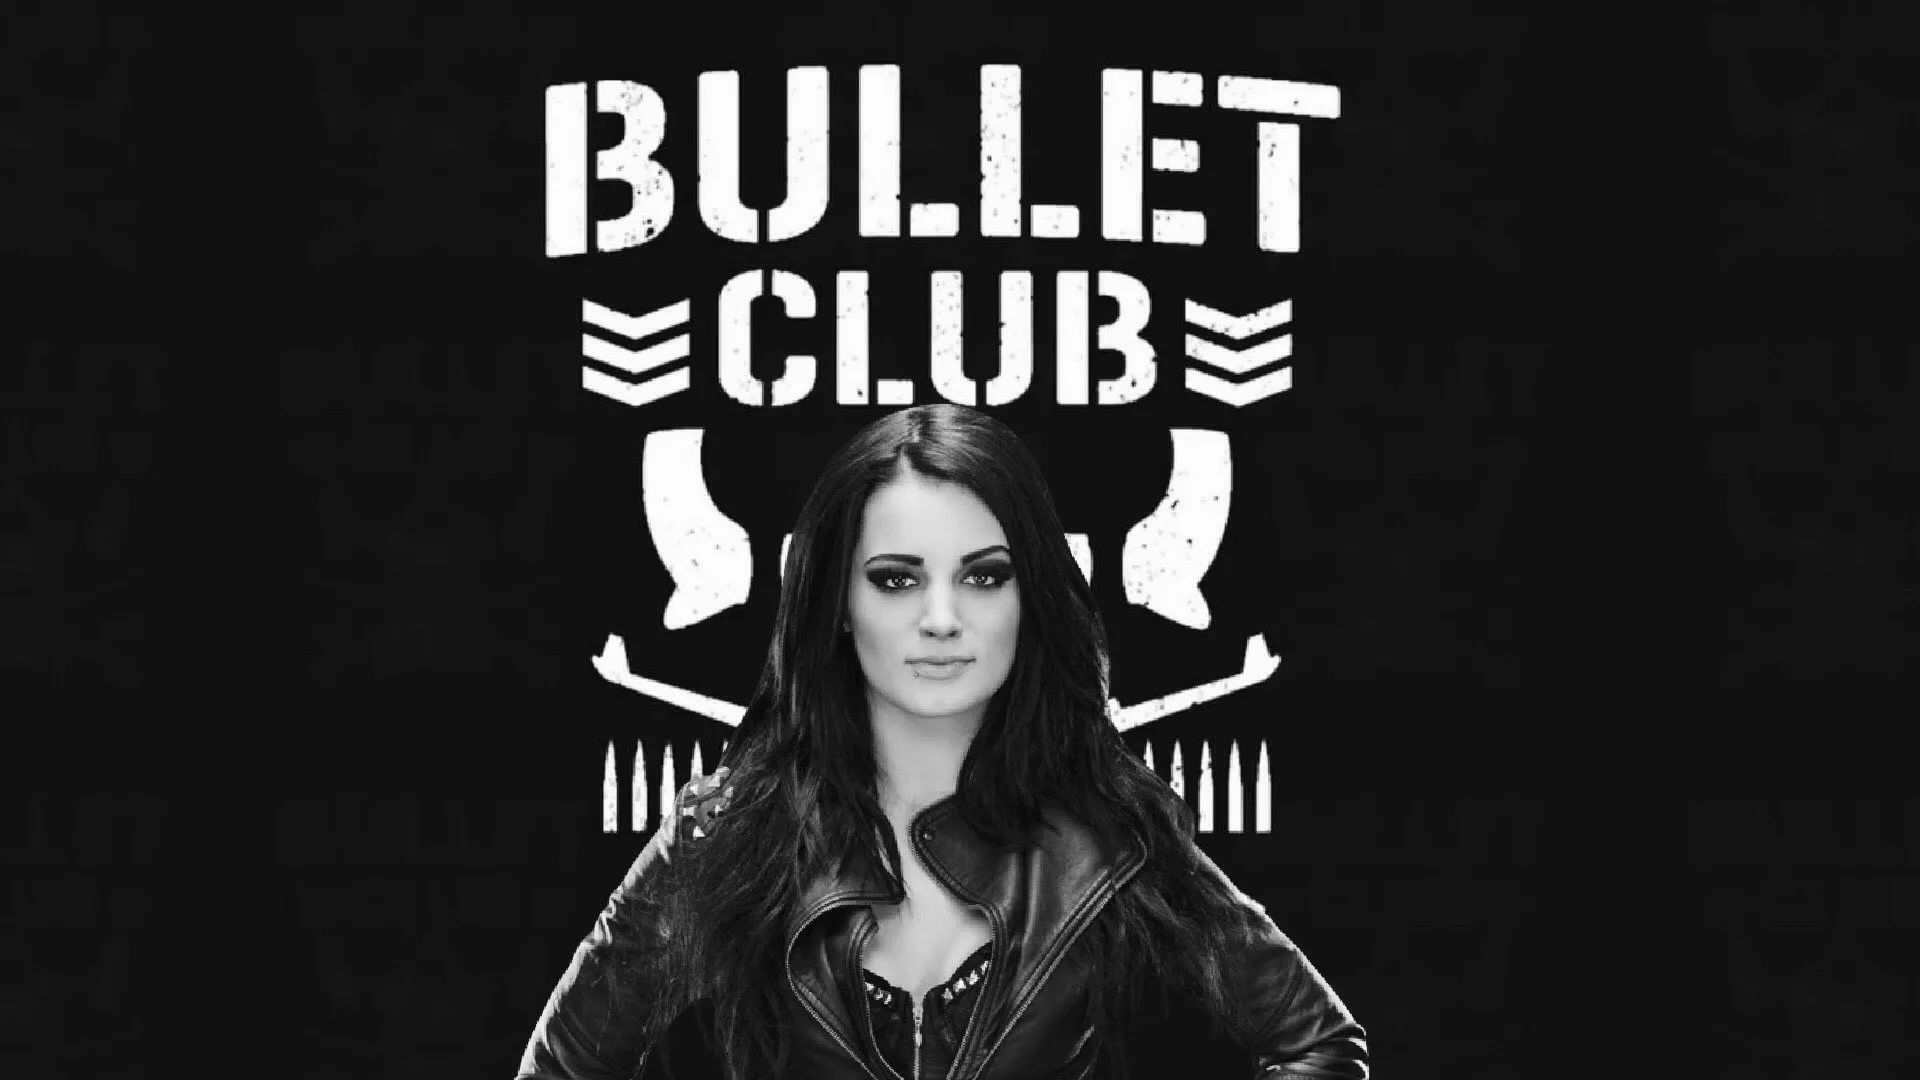 Bullet Club screen wallpaper